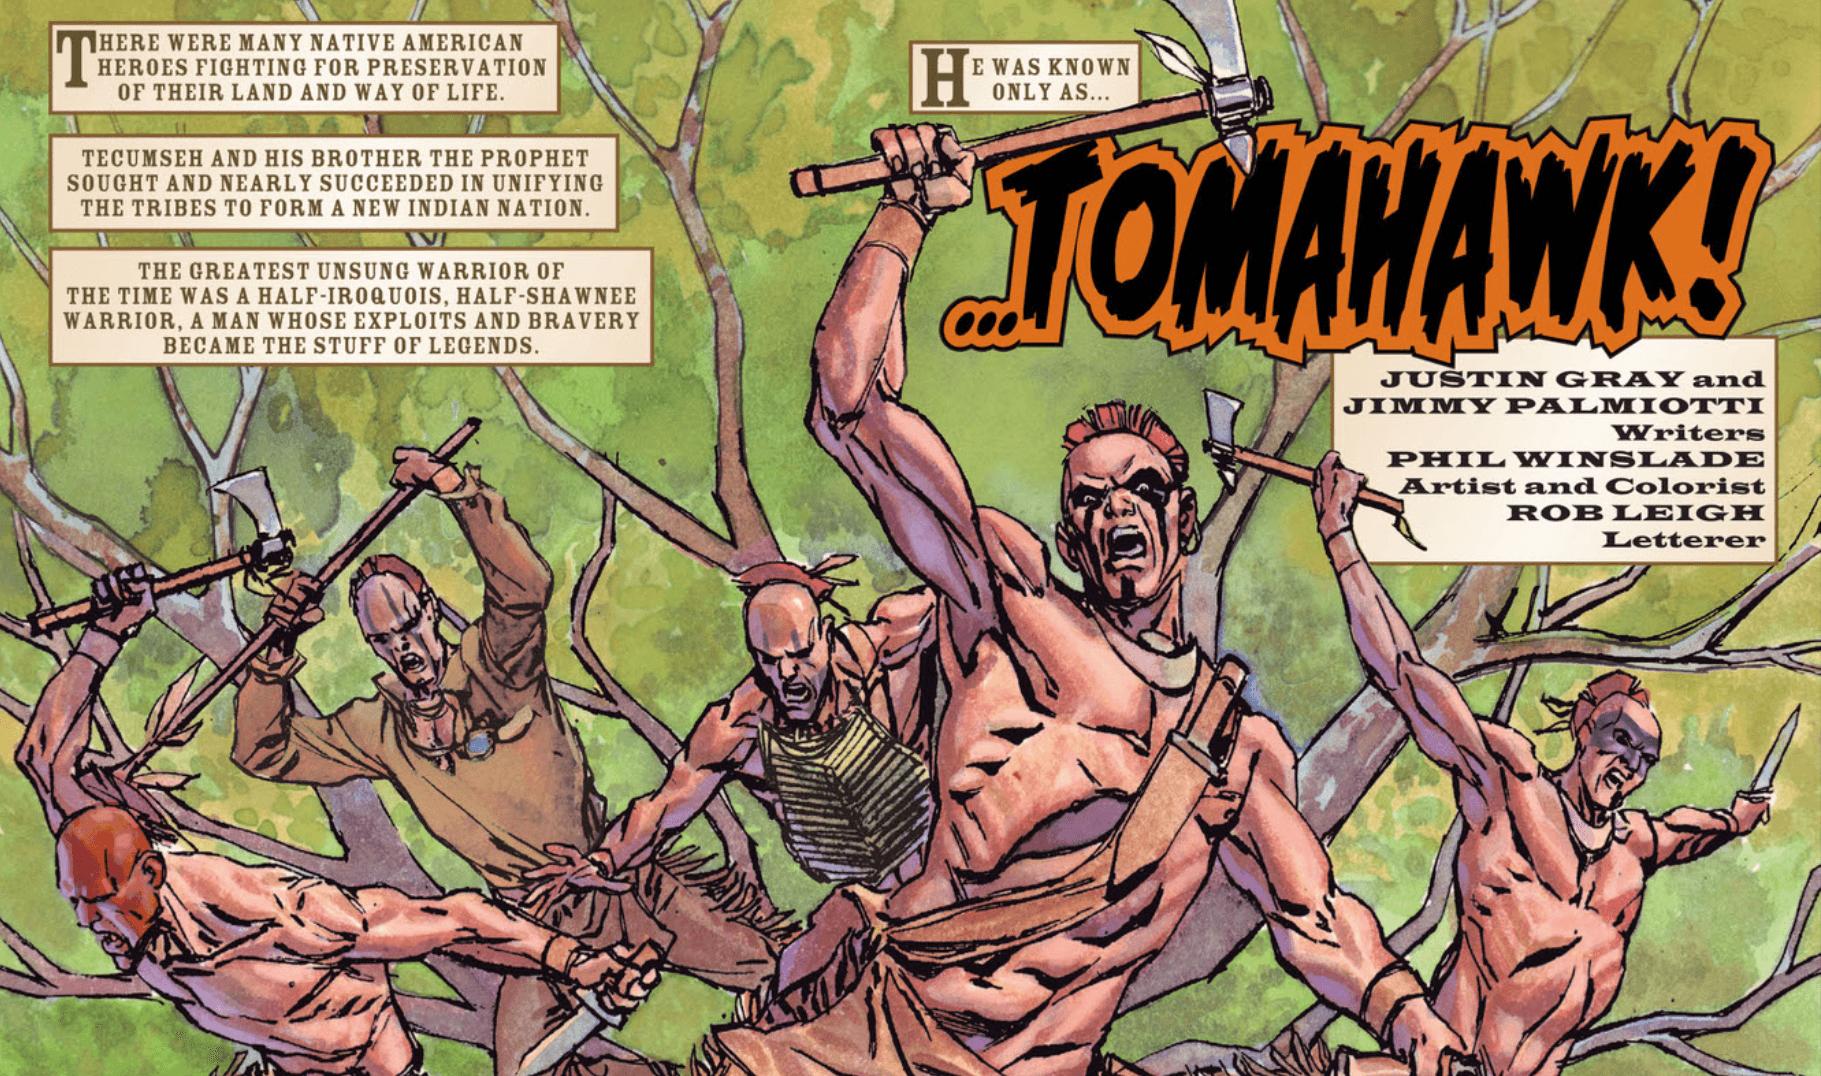 Tomahawk.png